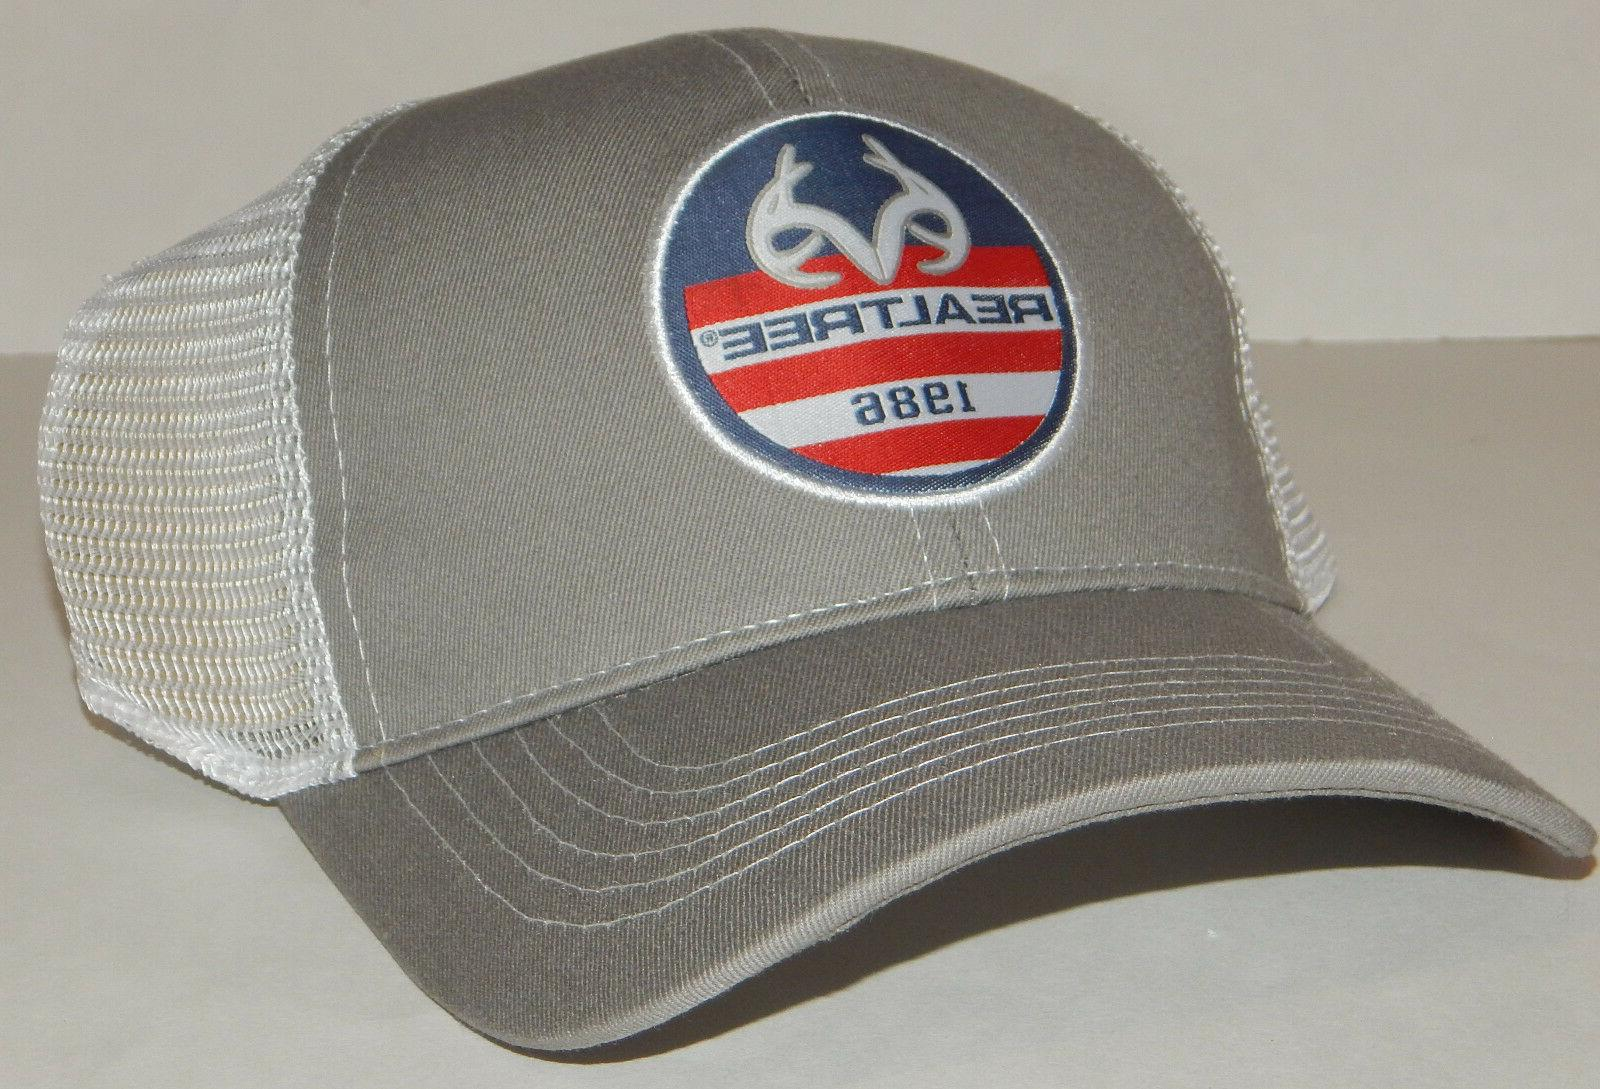 REALTREE Outfitters / Cap Deer